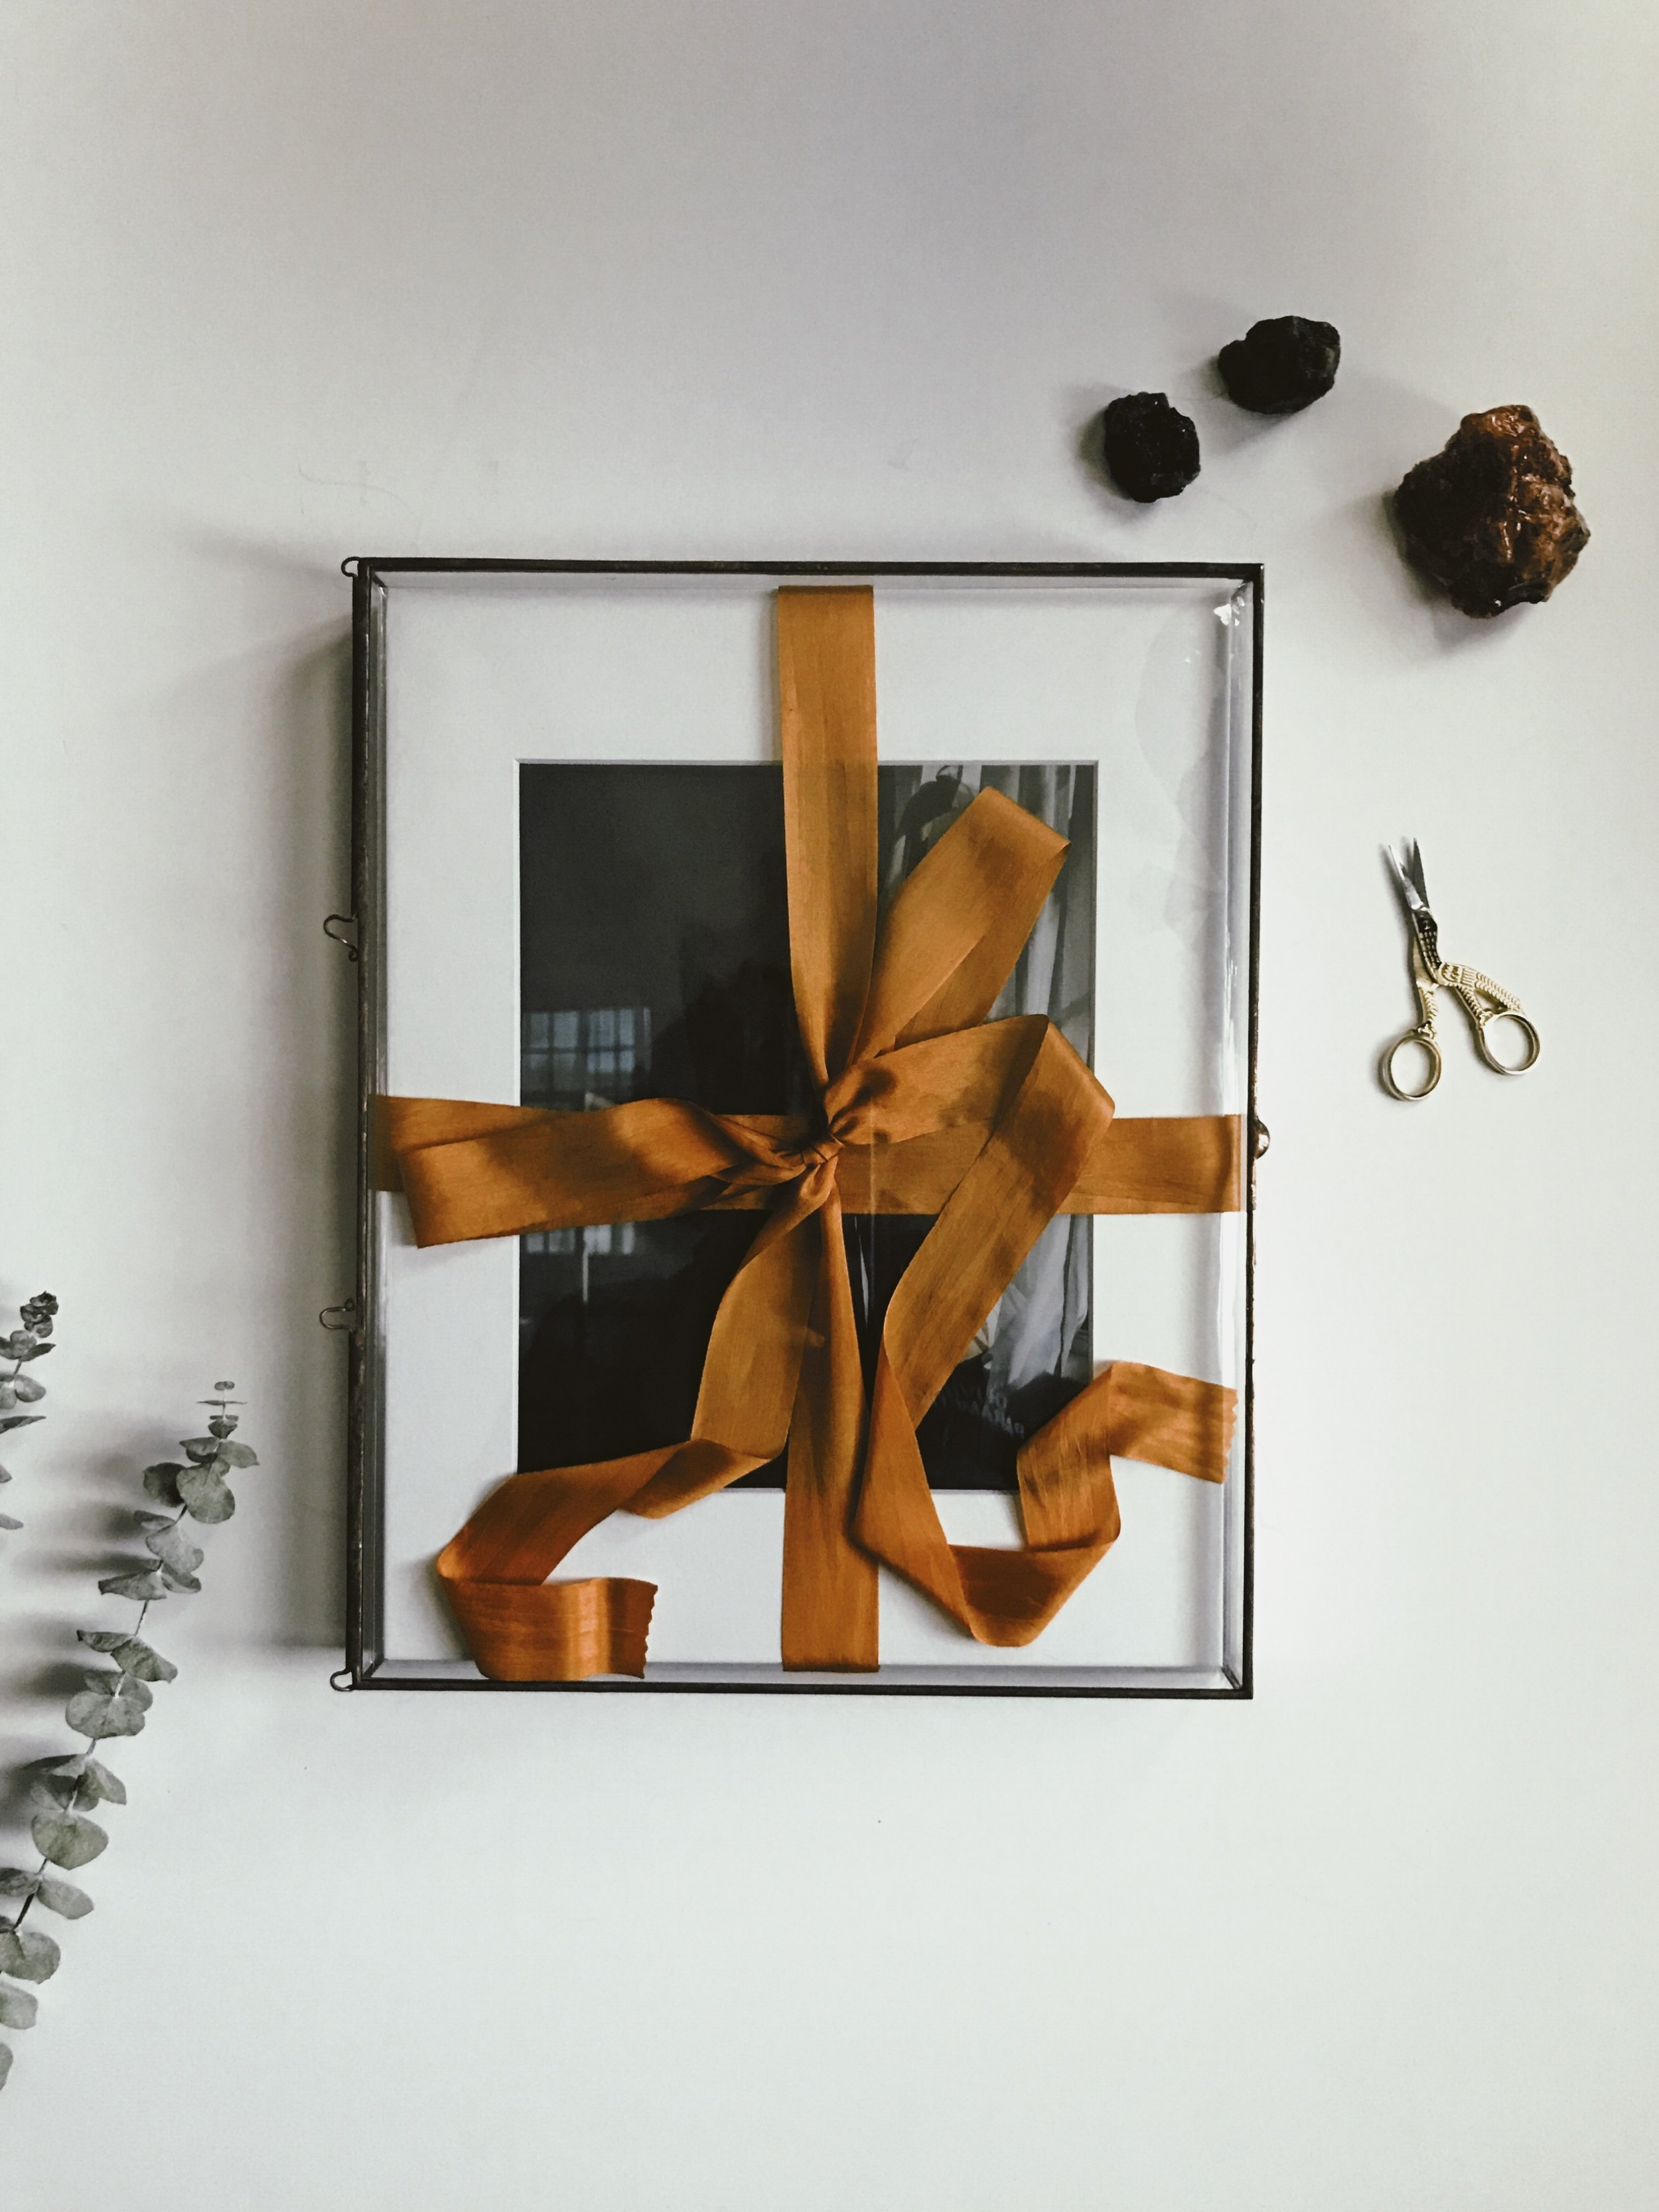 copperandsagecollective-grand-rapids-photographer-fine-art-prints-in0keepsake-box